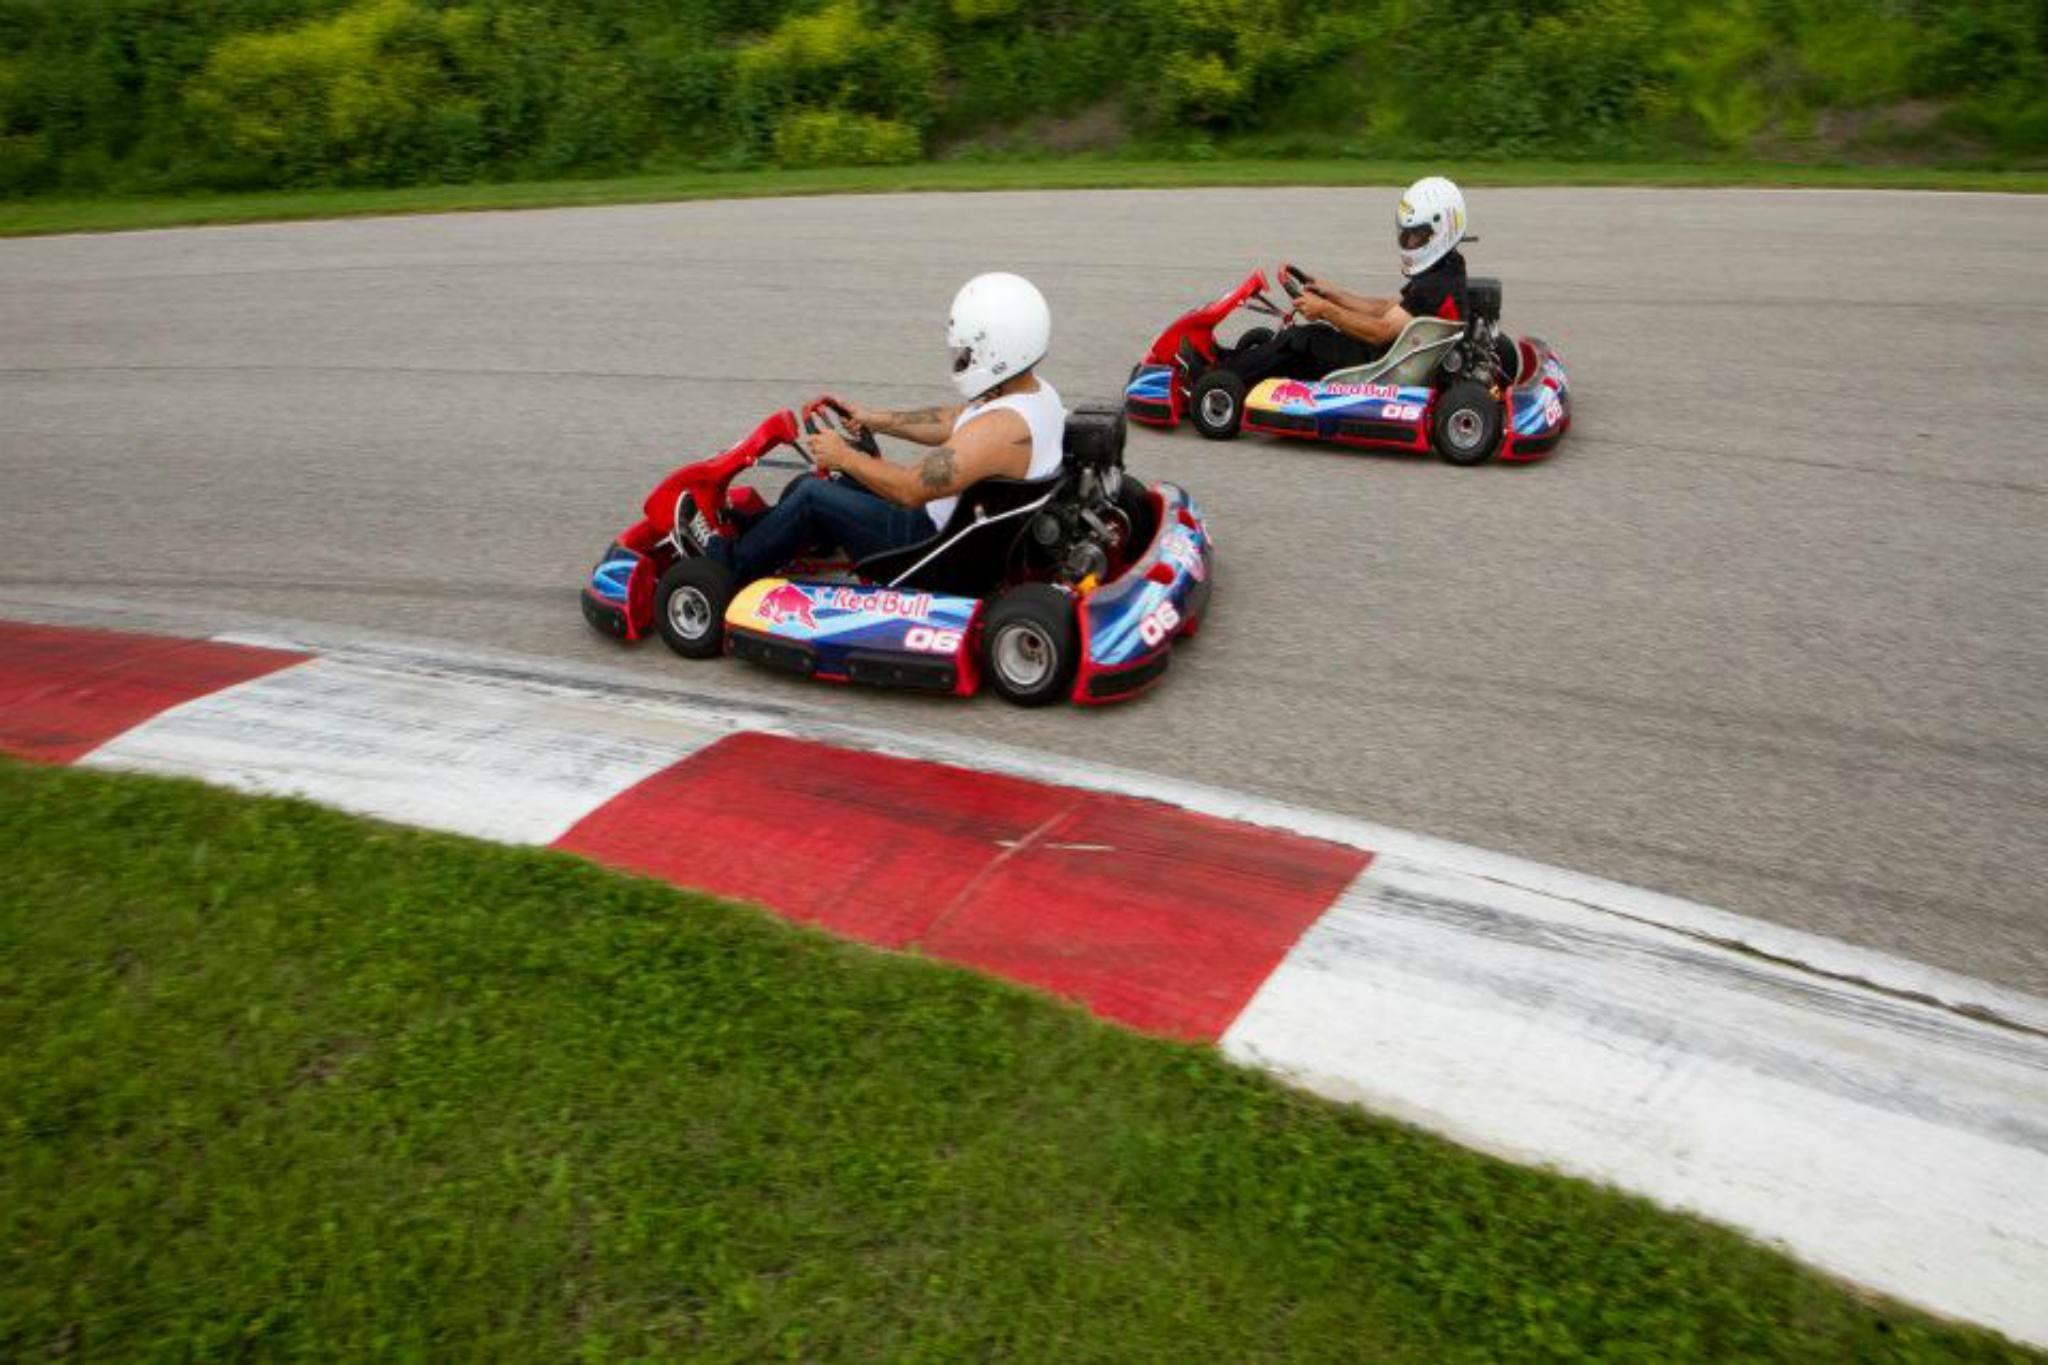 Road Racing Course or Karting at Driveway Austin